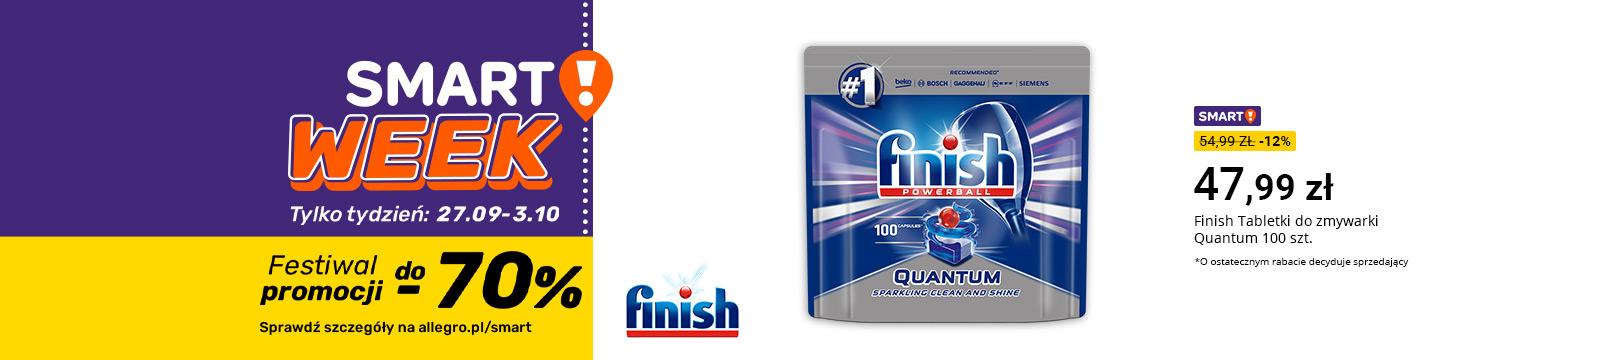 1600x360 finish quantum 100 smart week allegro rb